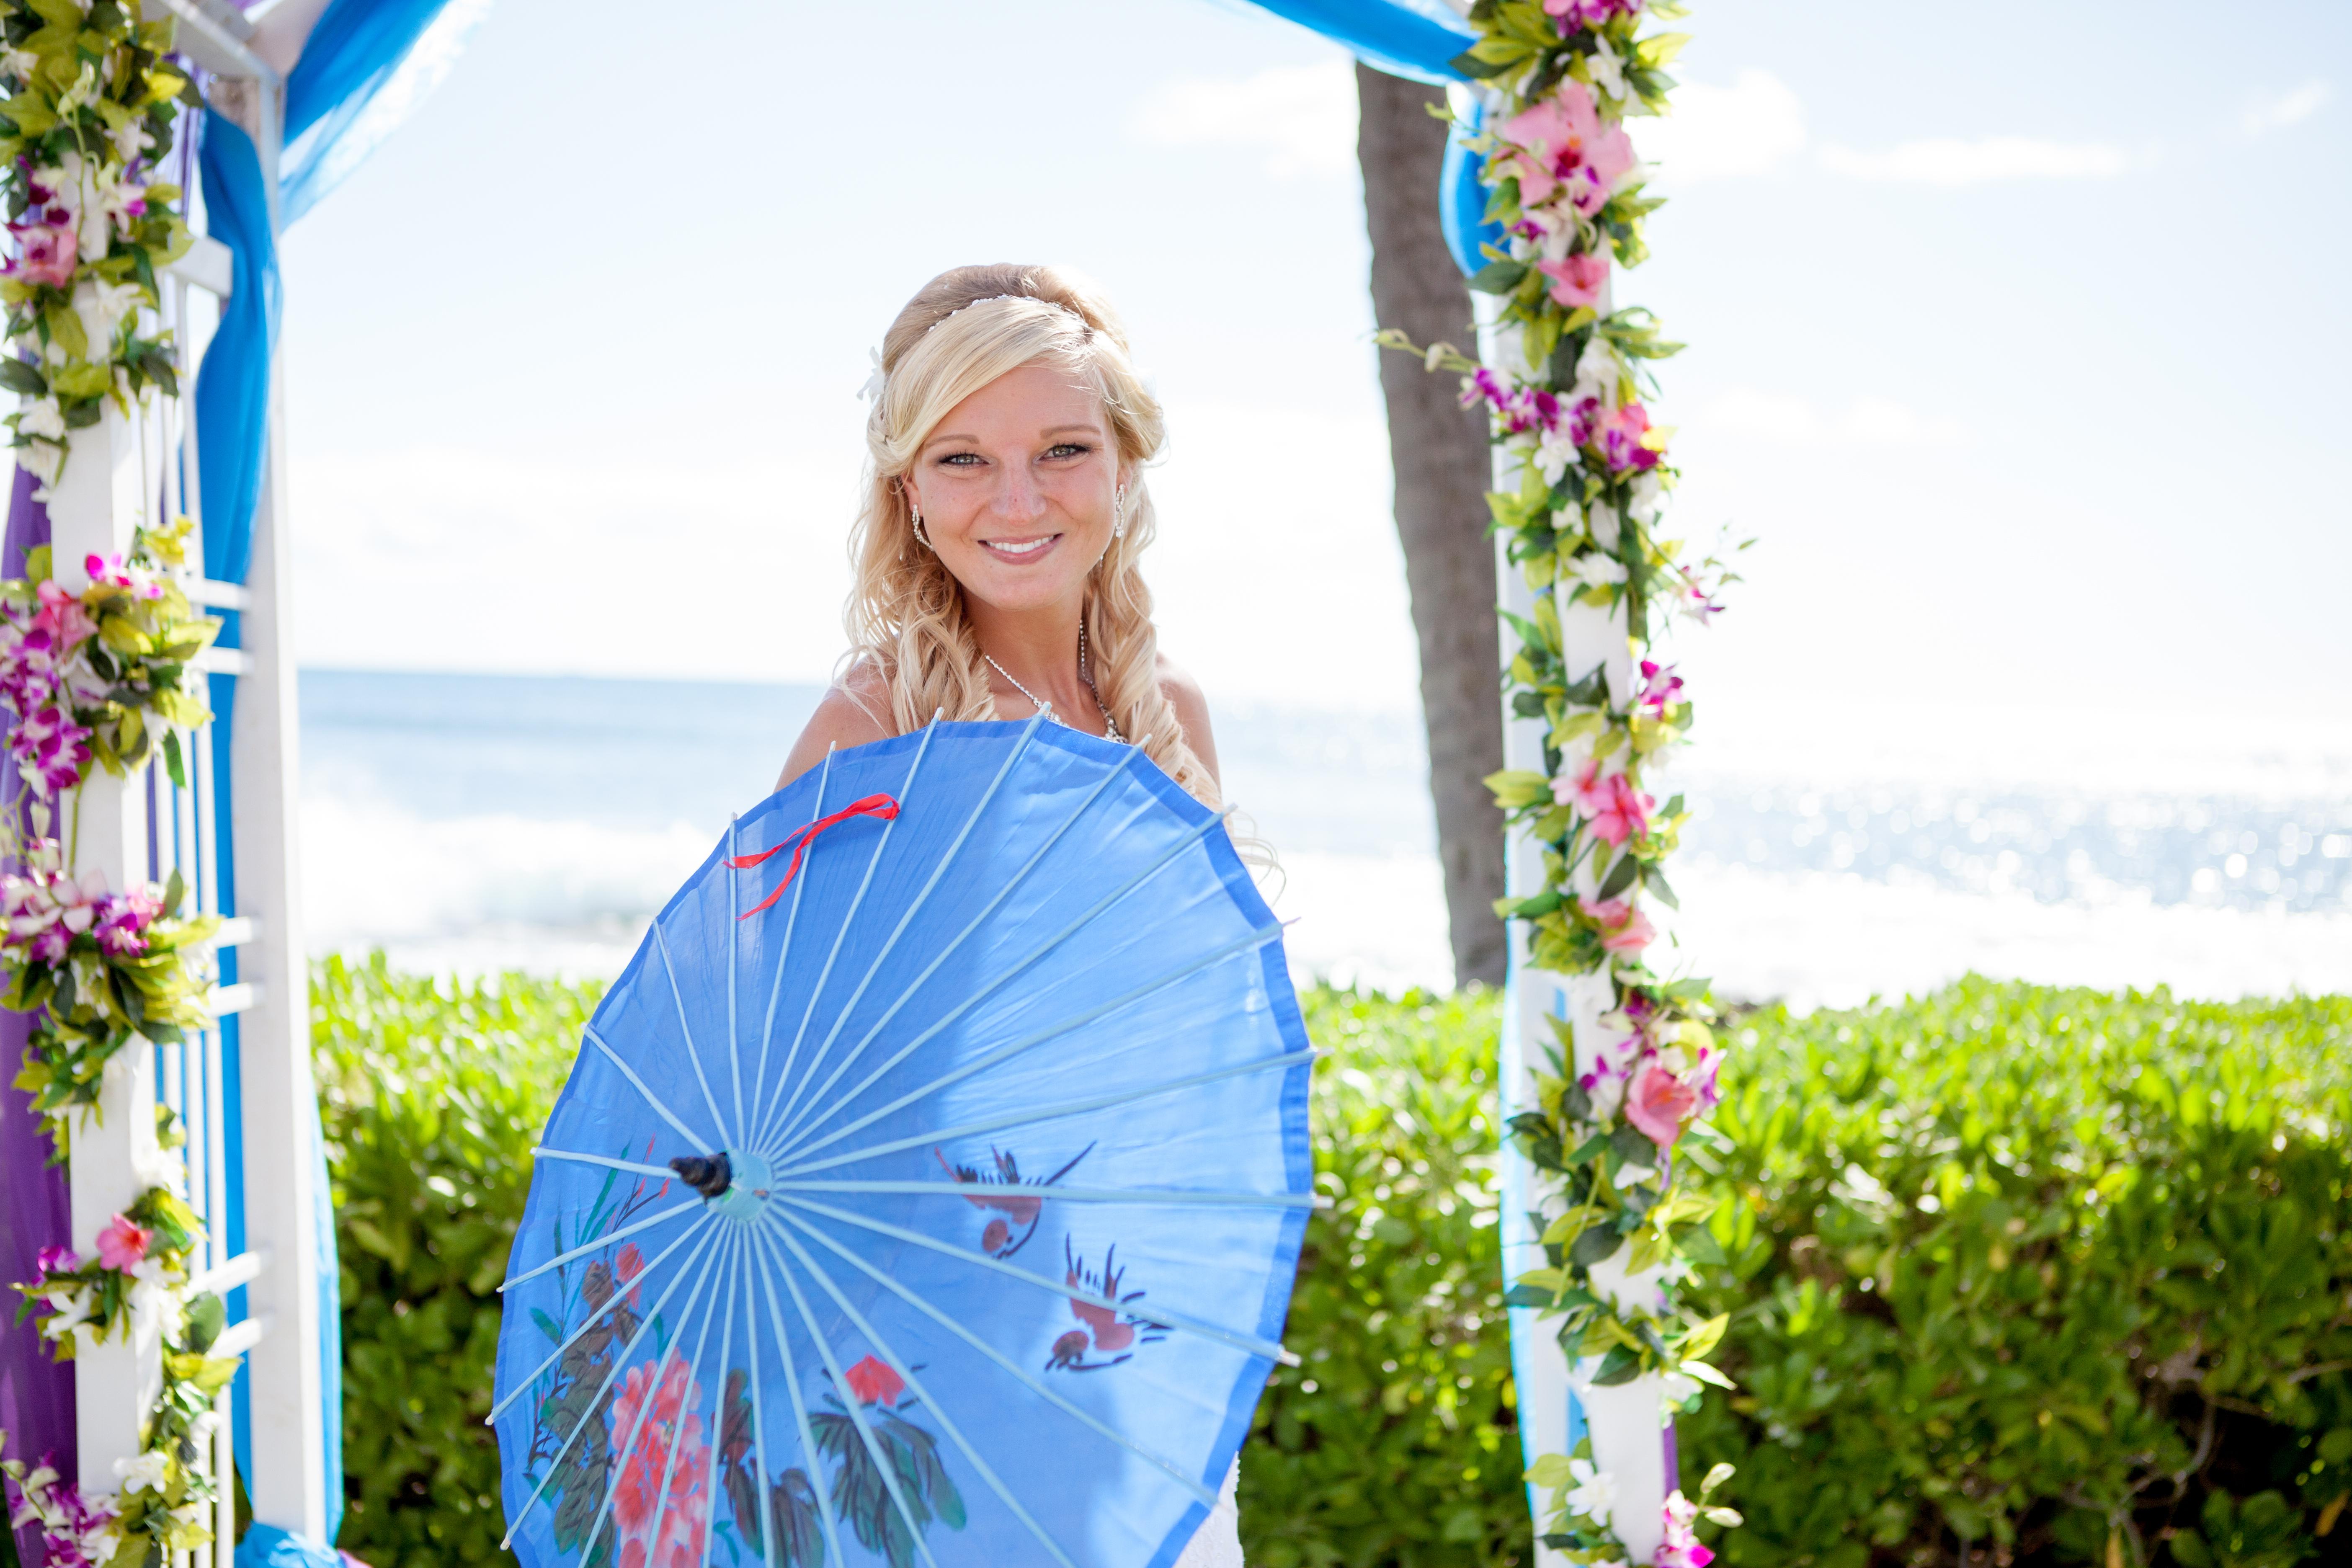 Hawaii wedding paradise cove 29